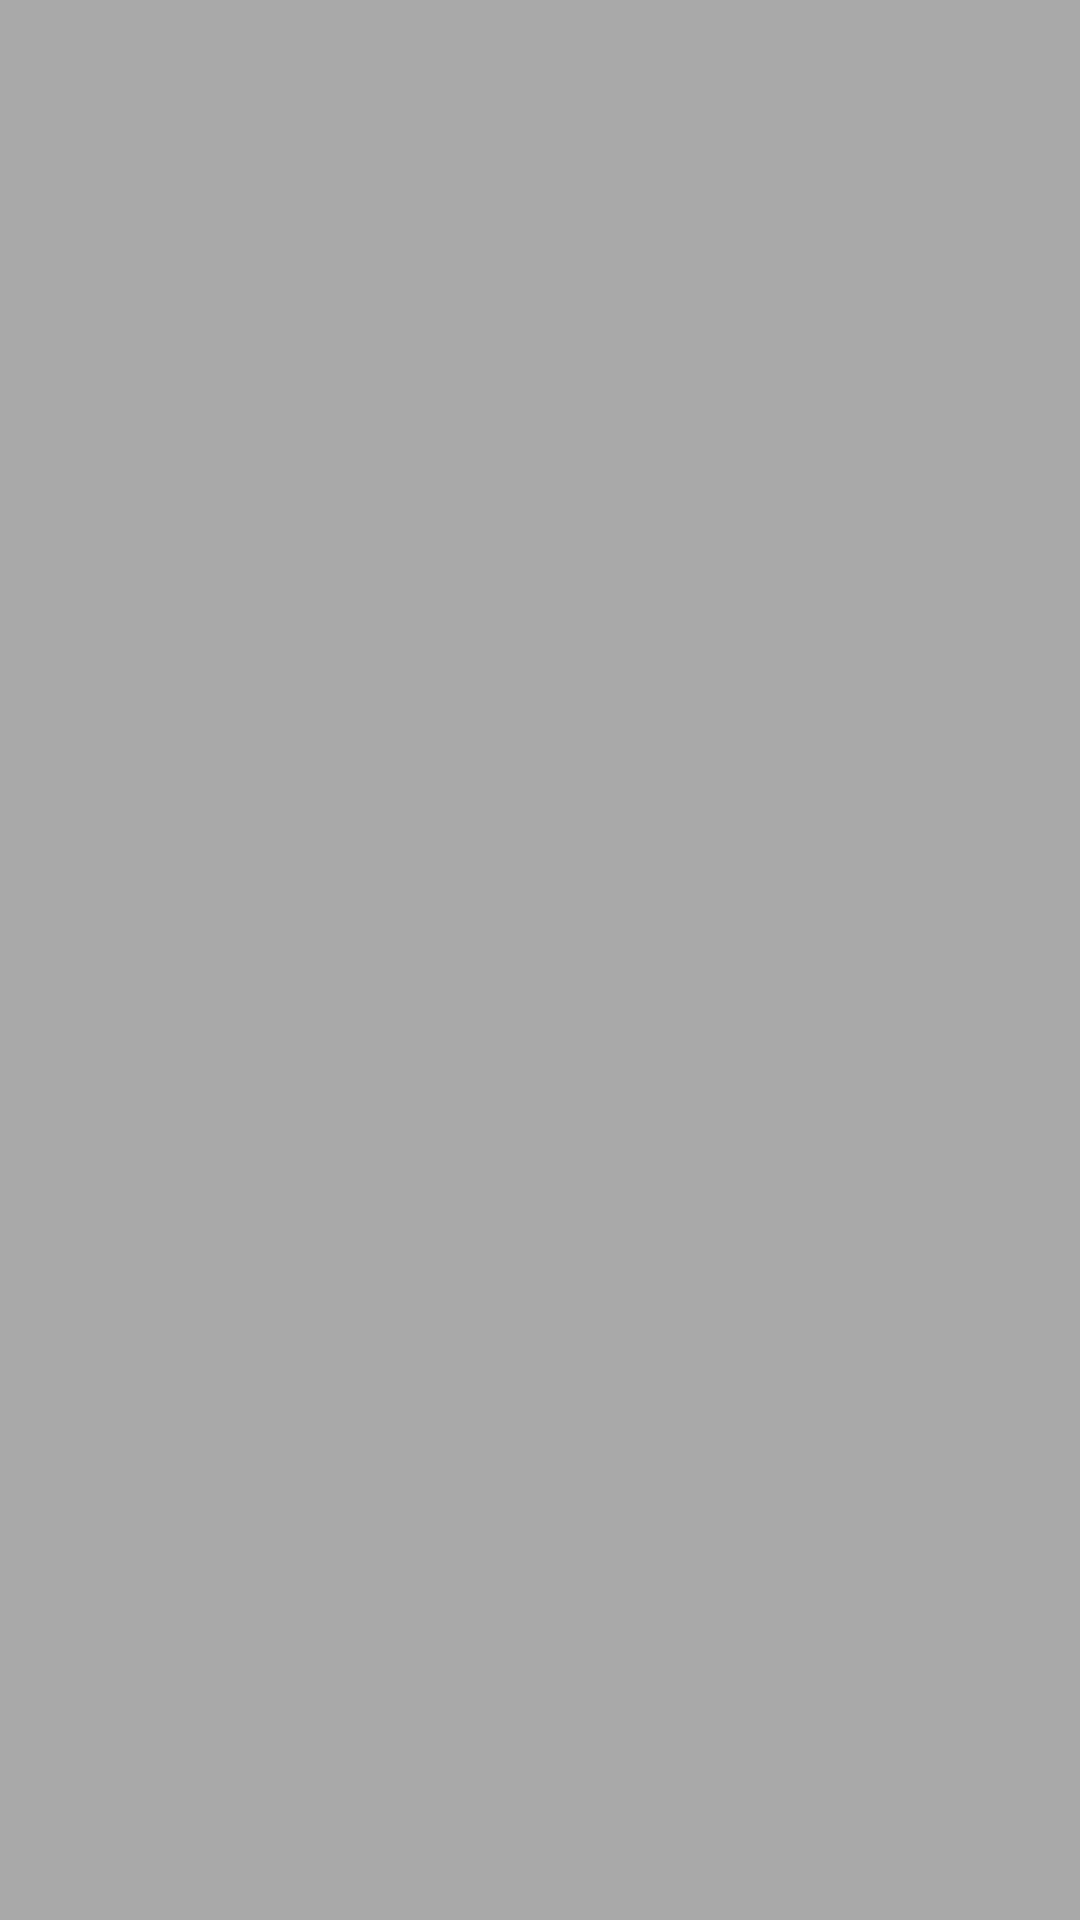 1080x1920 Dark Gray Solid Color Background